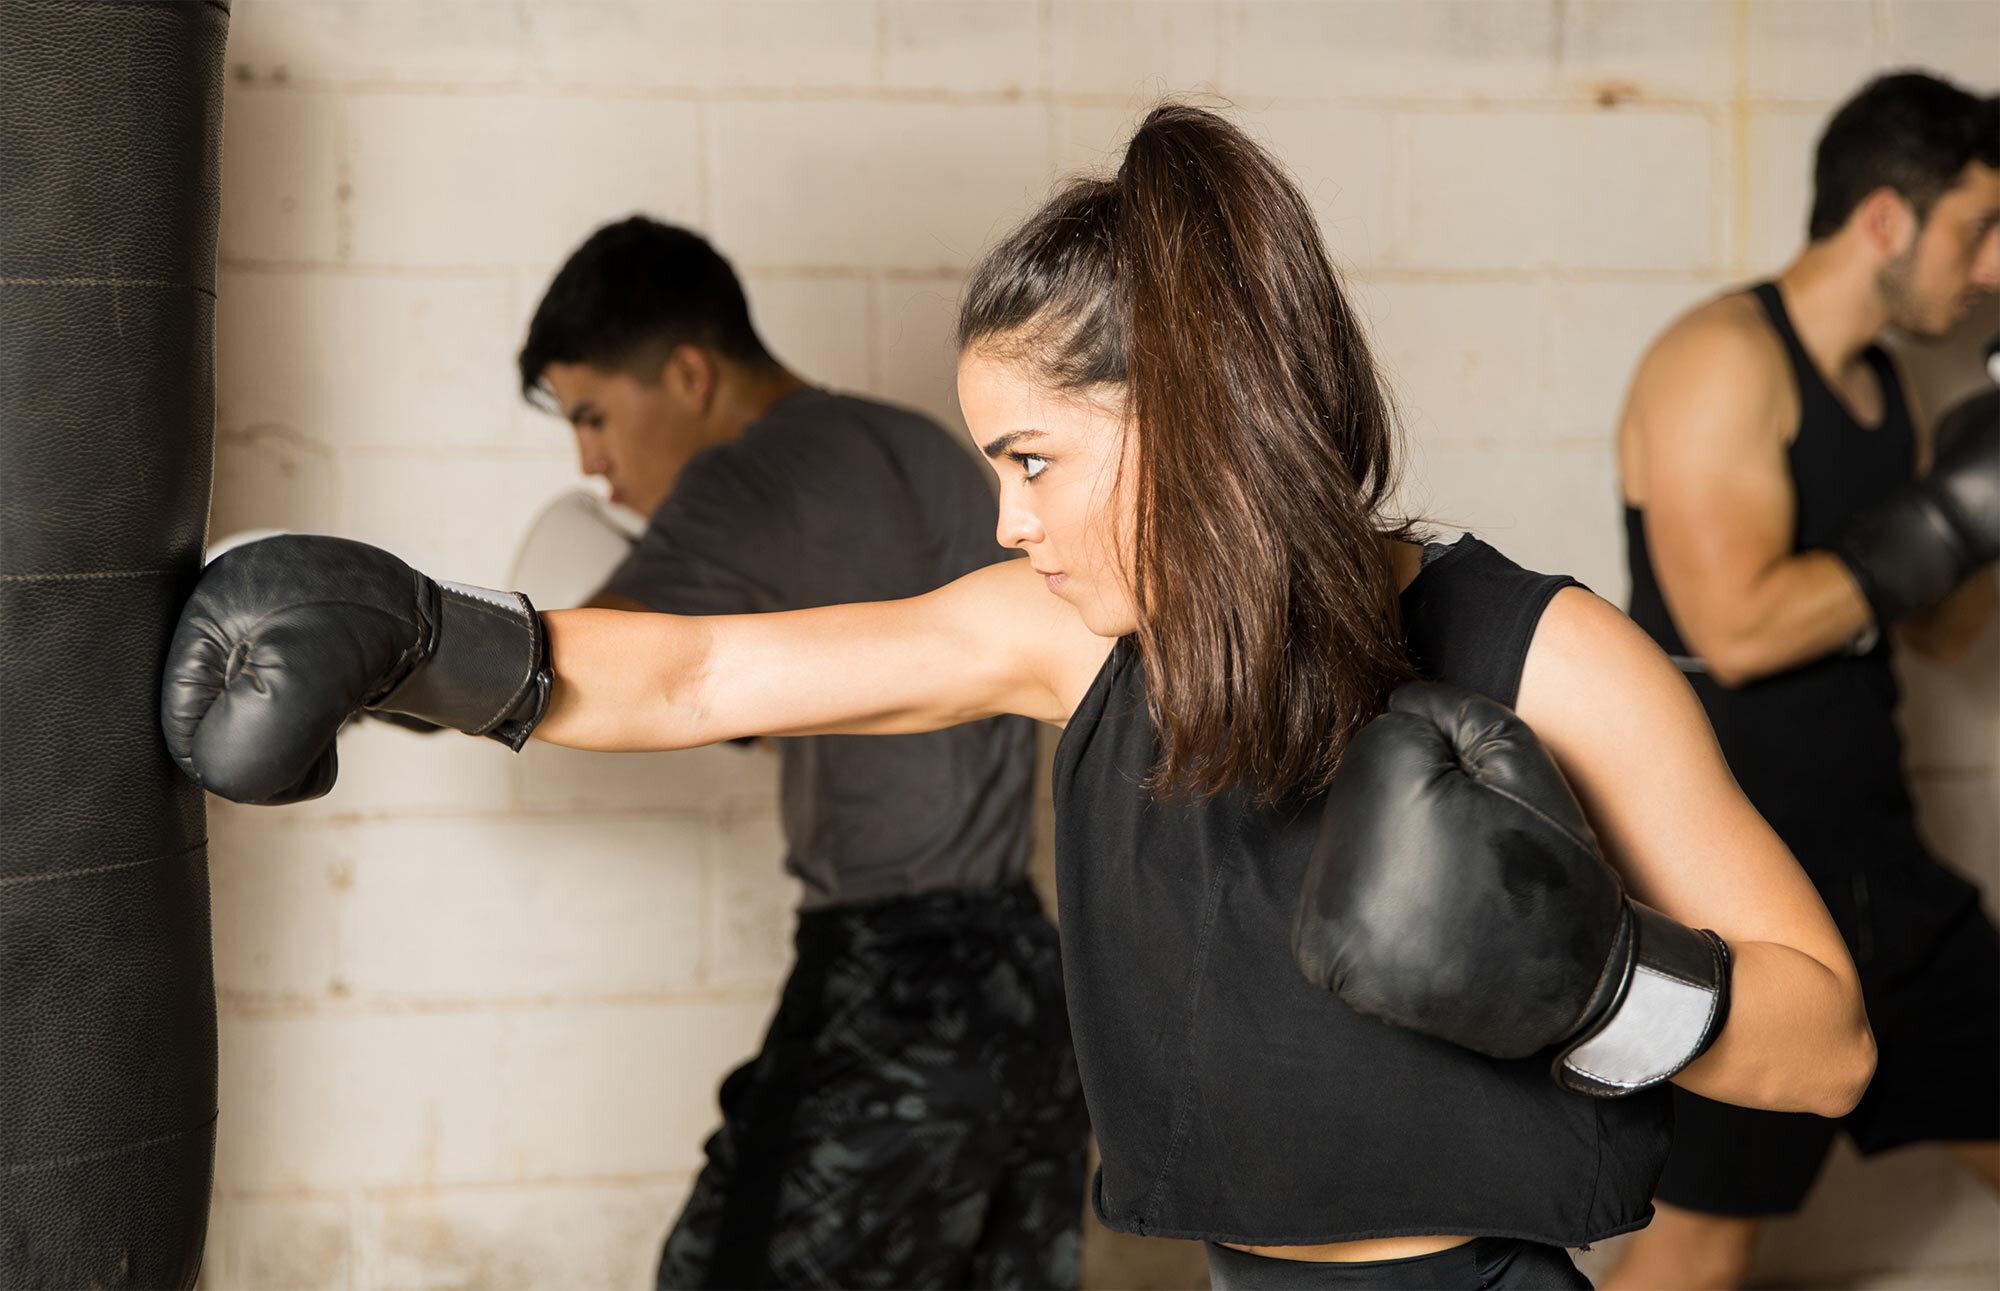 Boxing B&W image